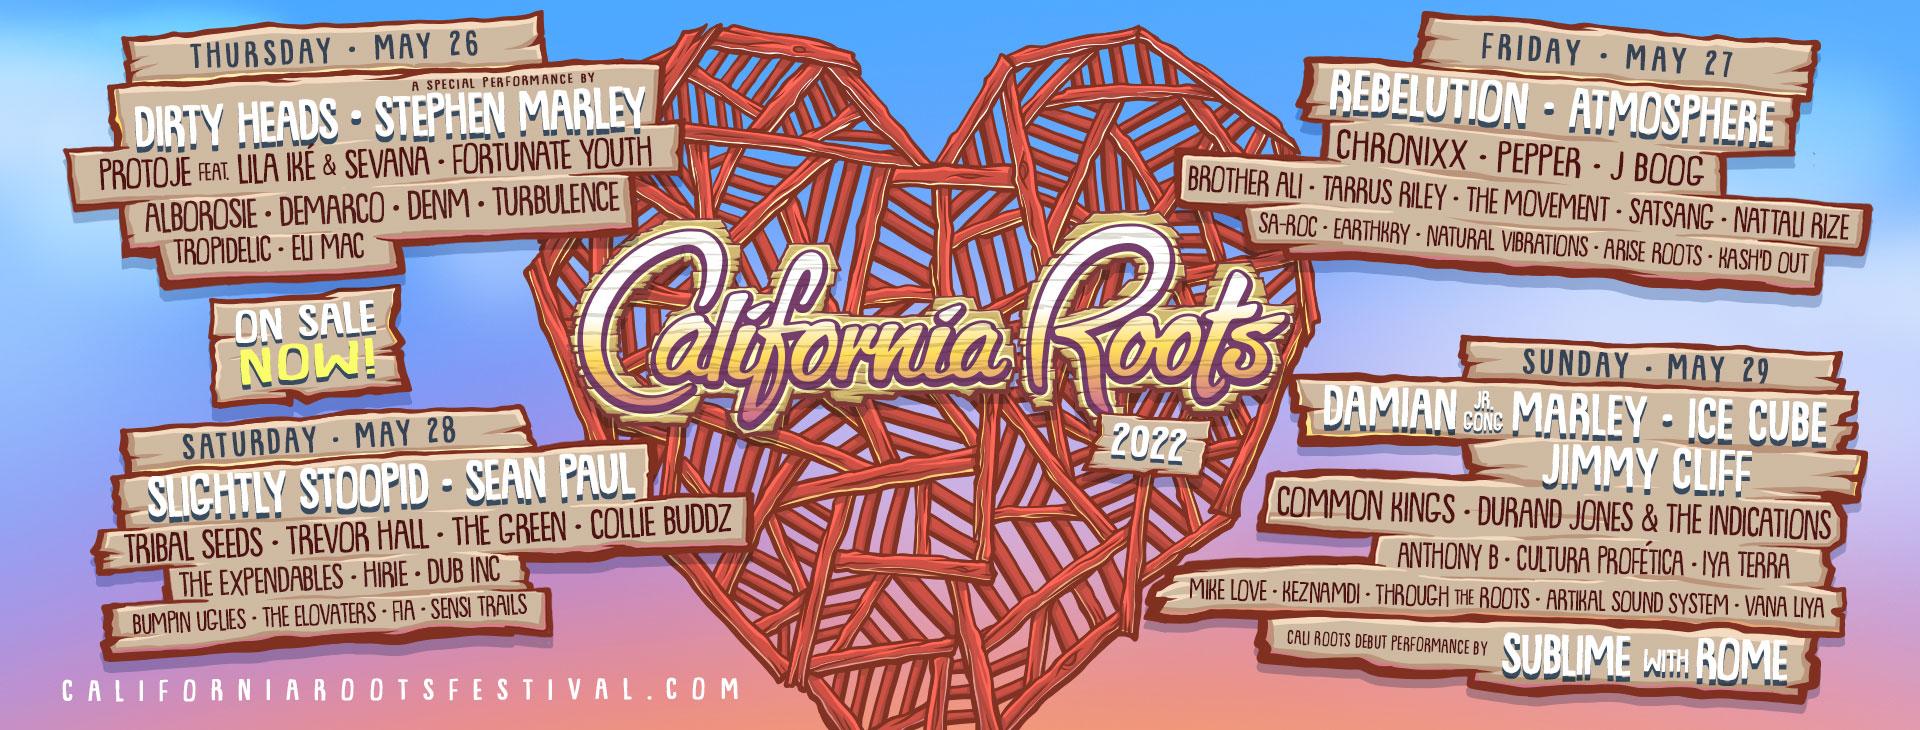 California Roots 2022